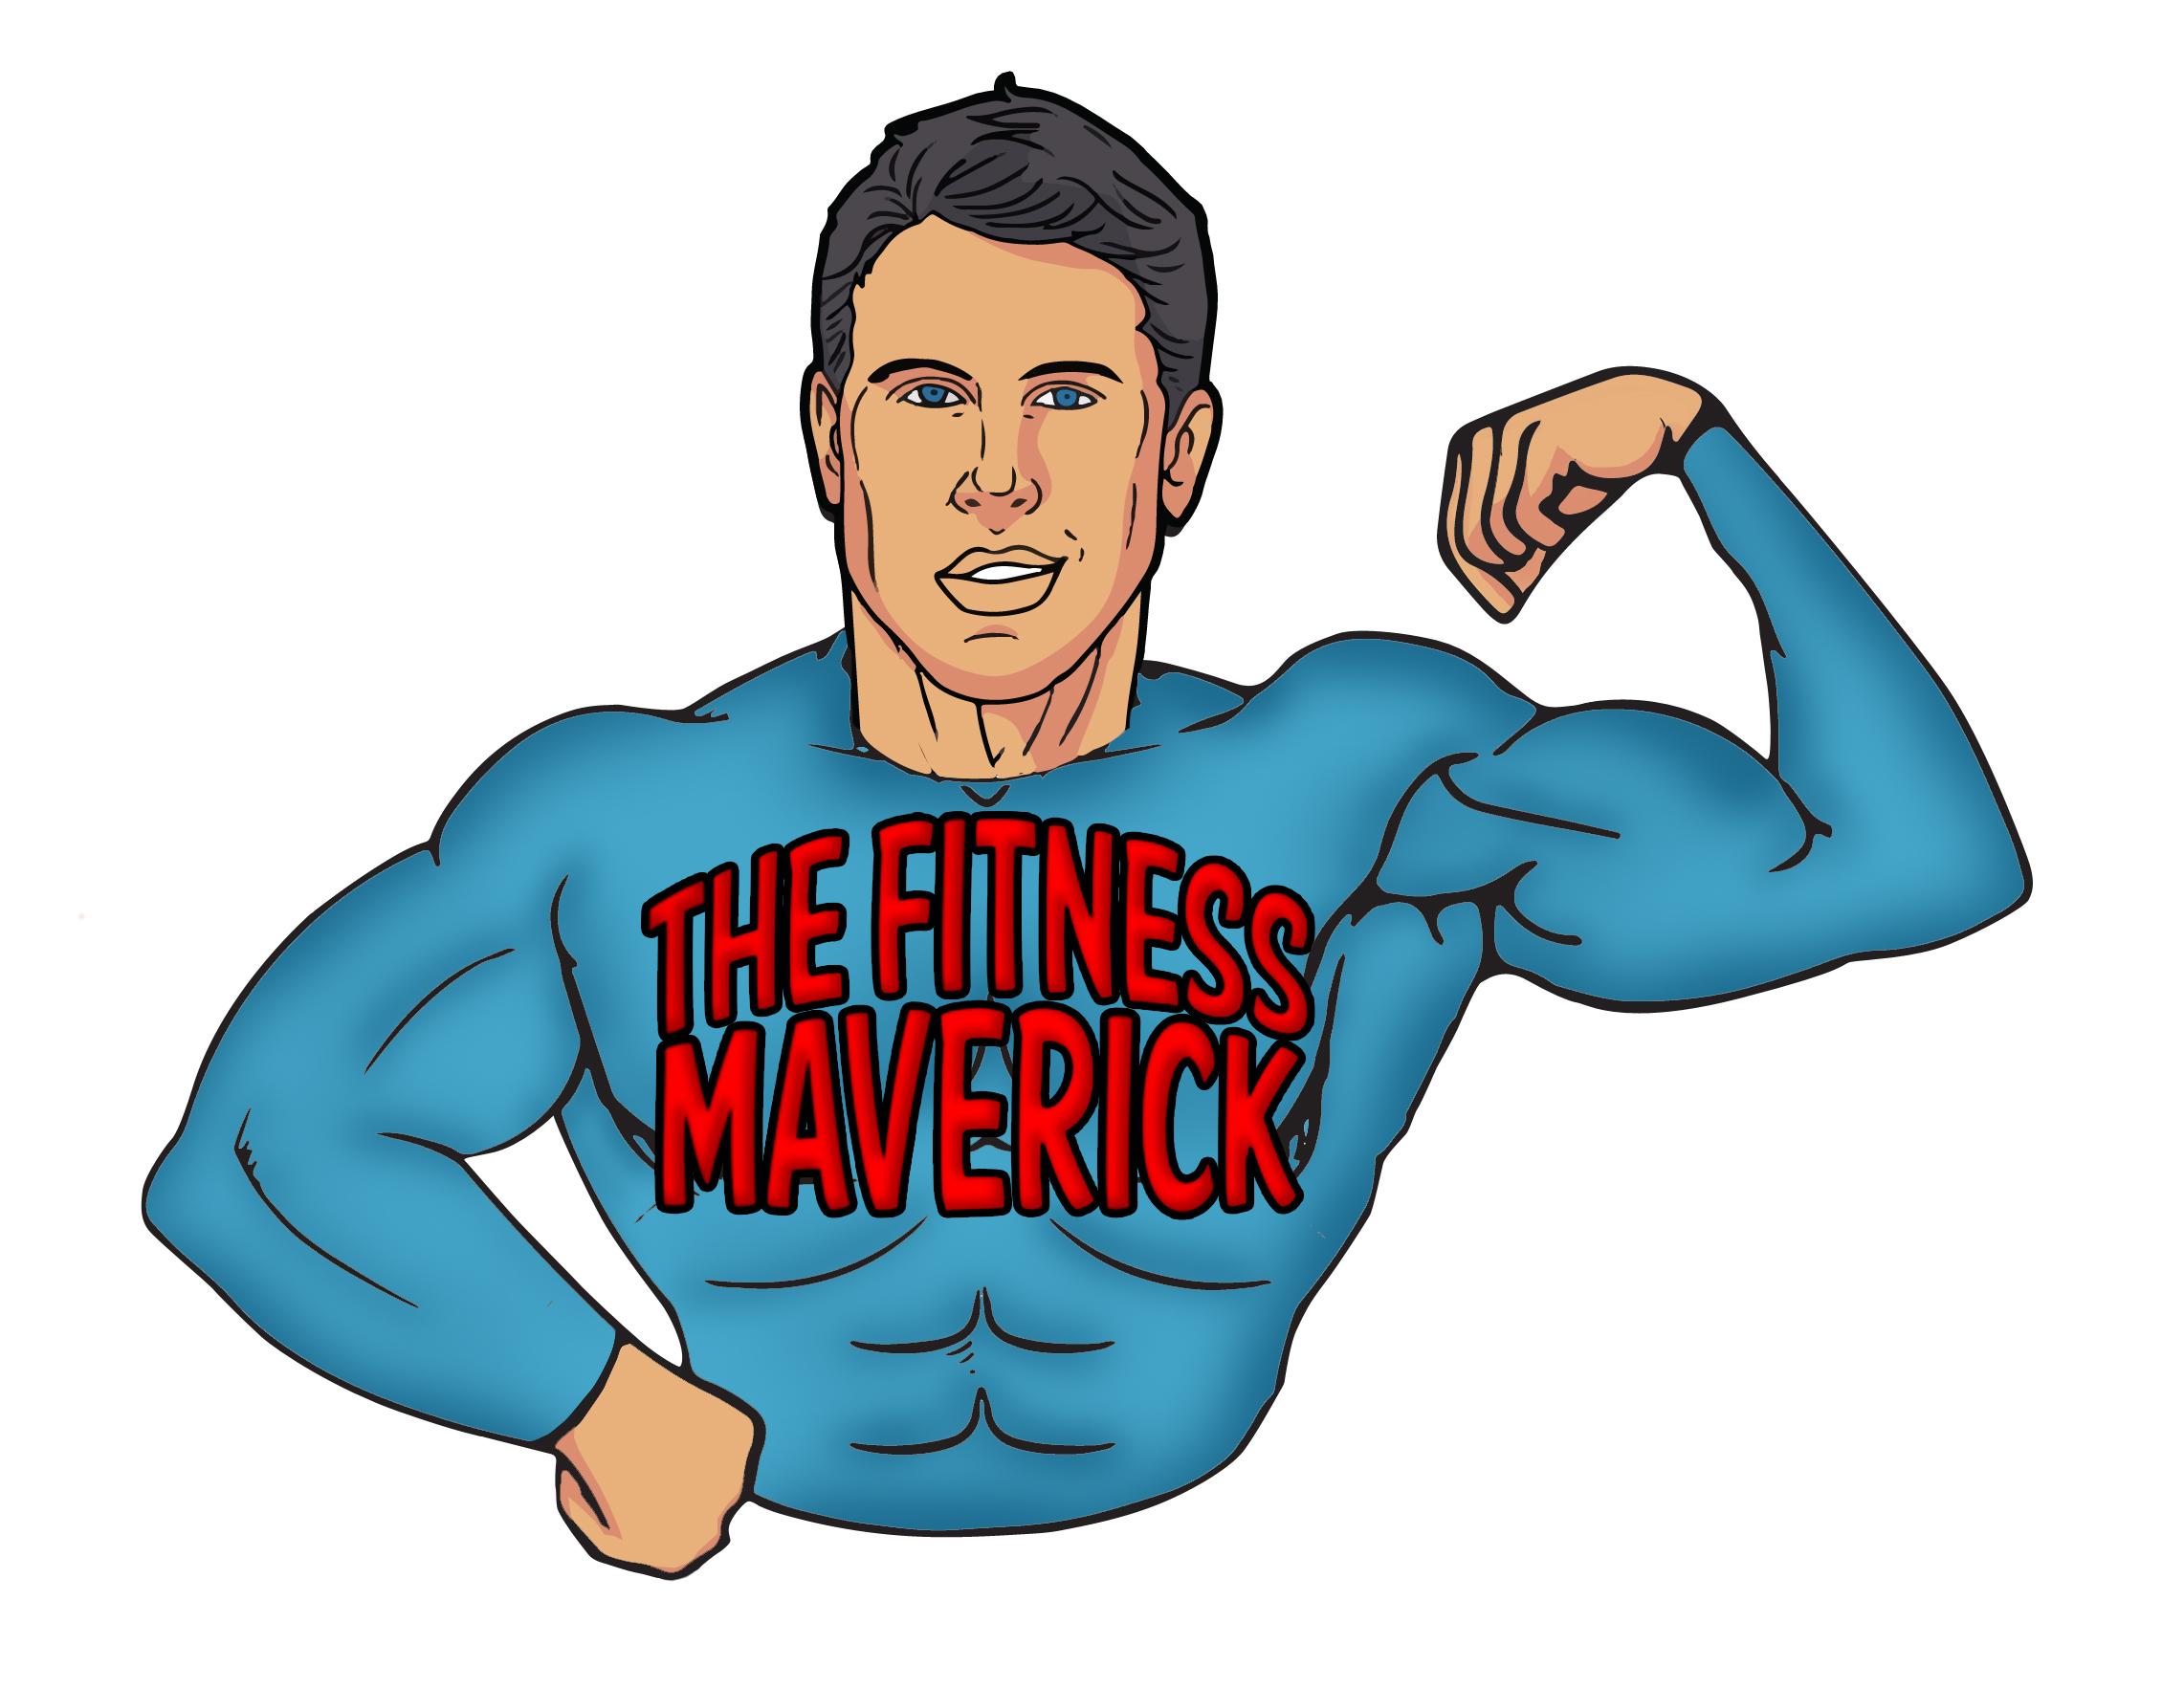 Gareth Sapstead - The Fitness Maverick